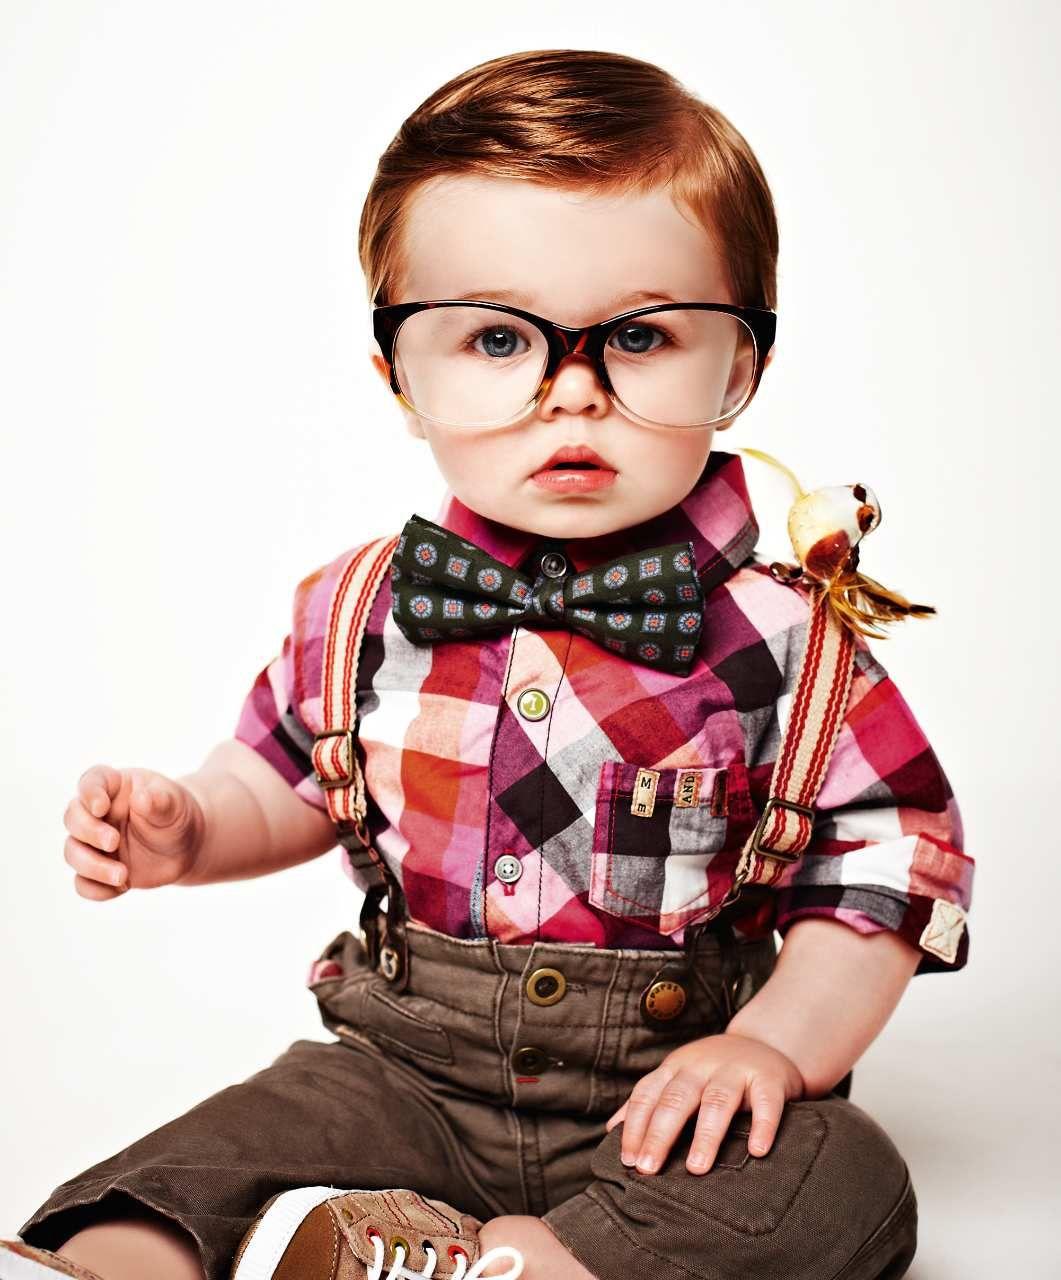 brainy! start 'em young